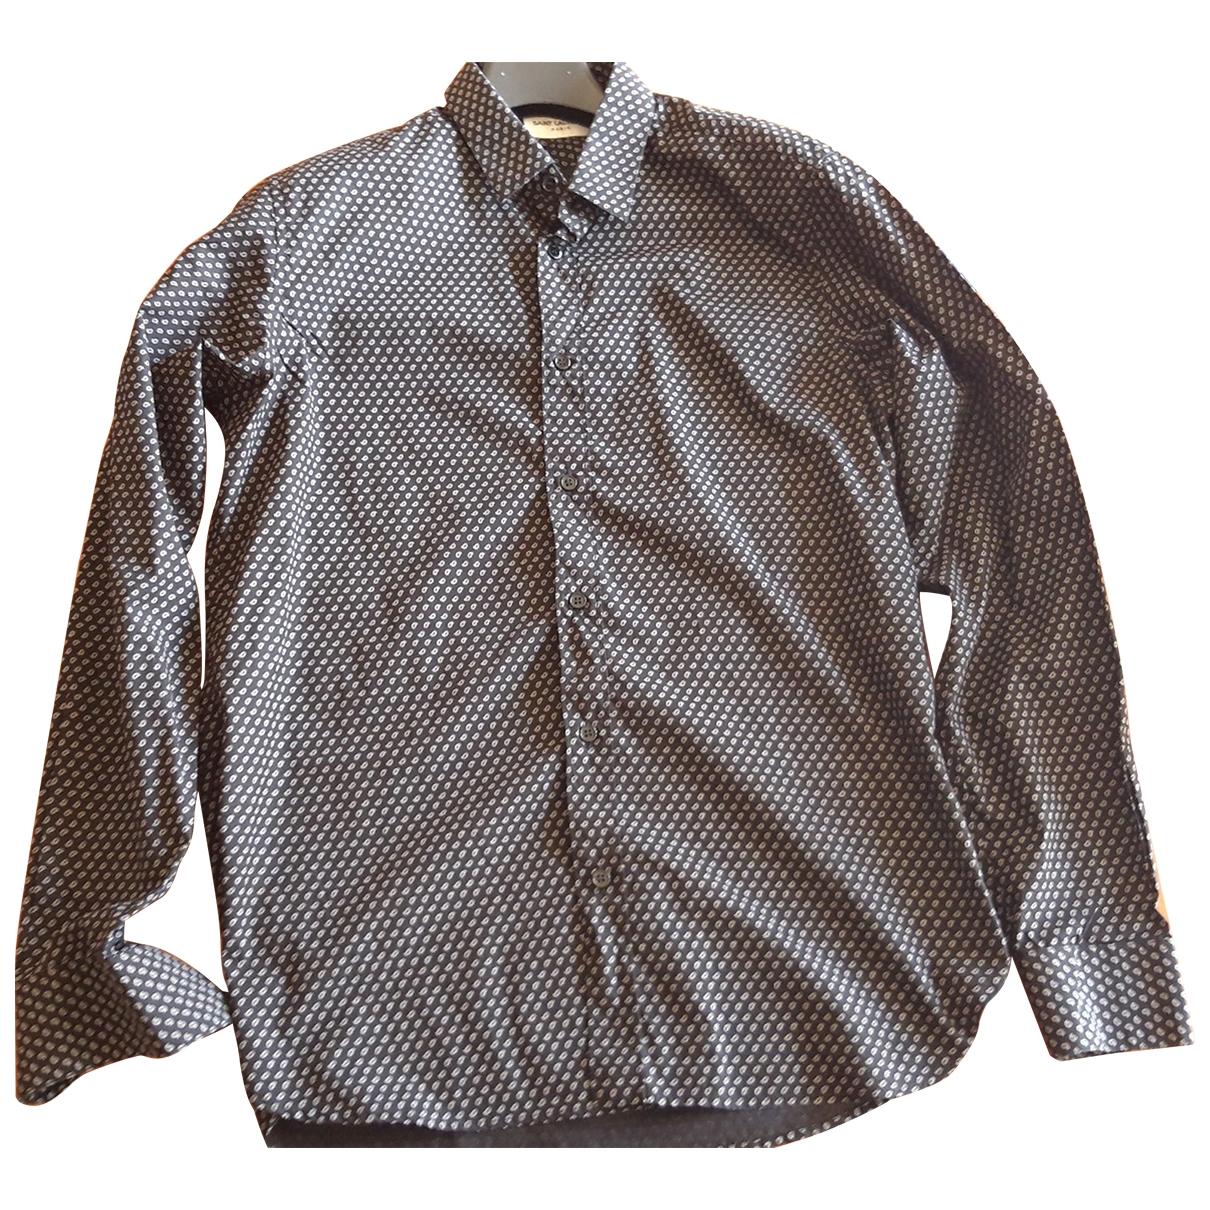 Saint Laurent \N Hemden in  Schwarz Baumwolle